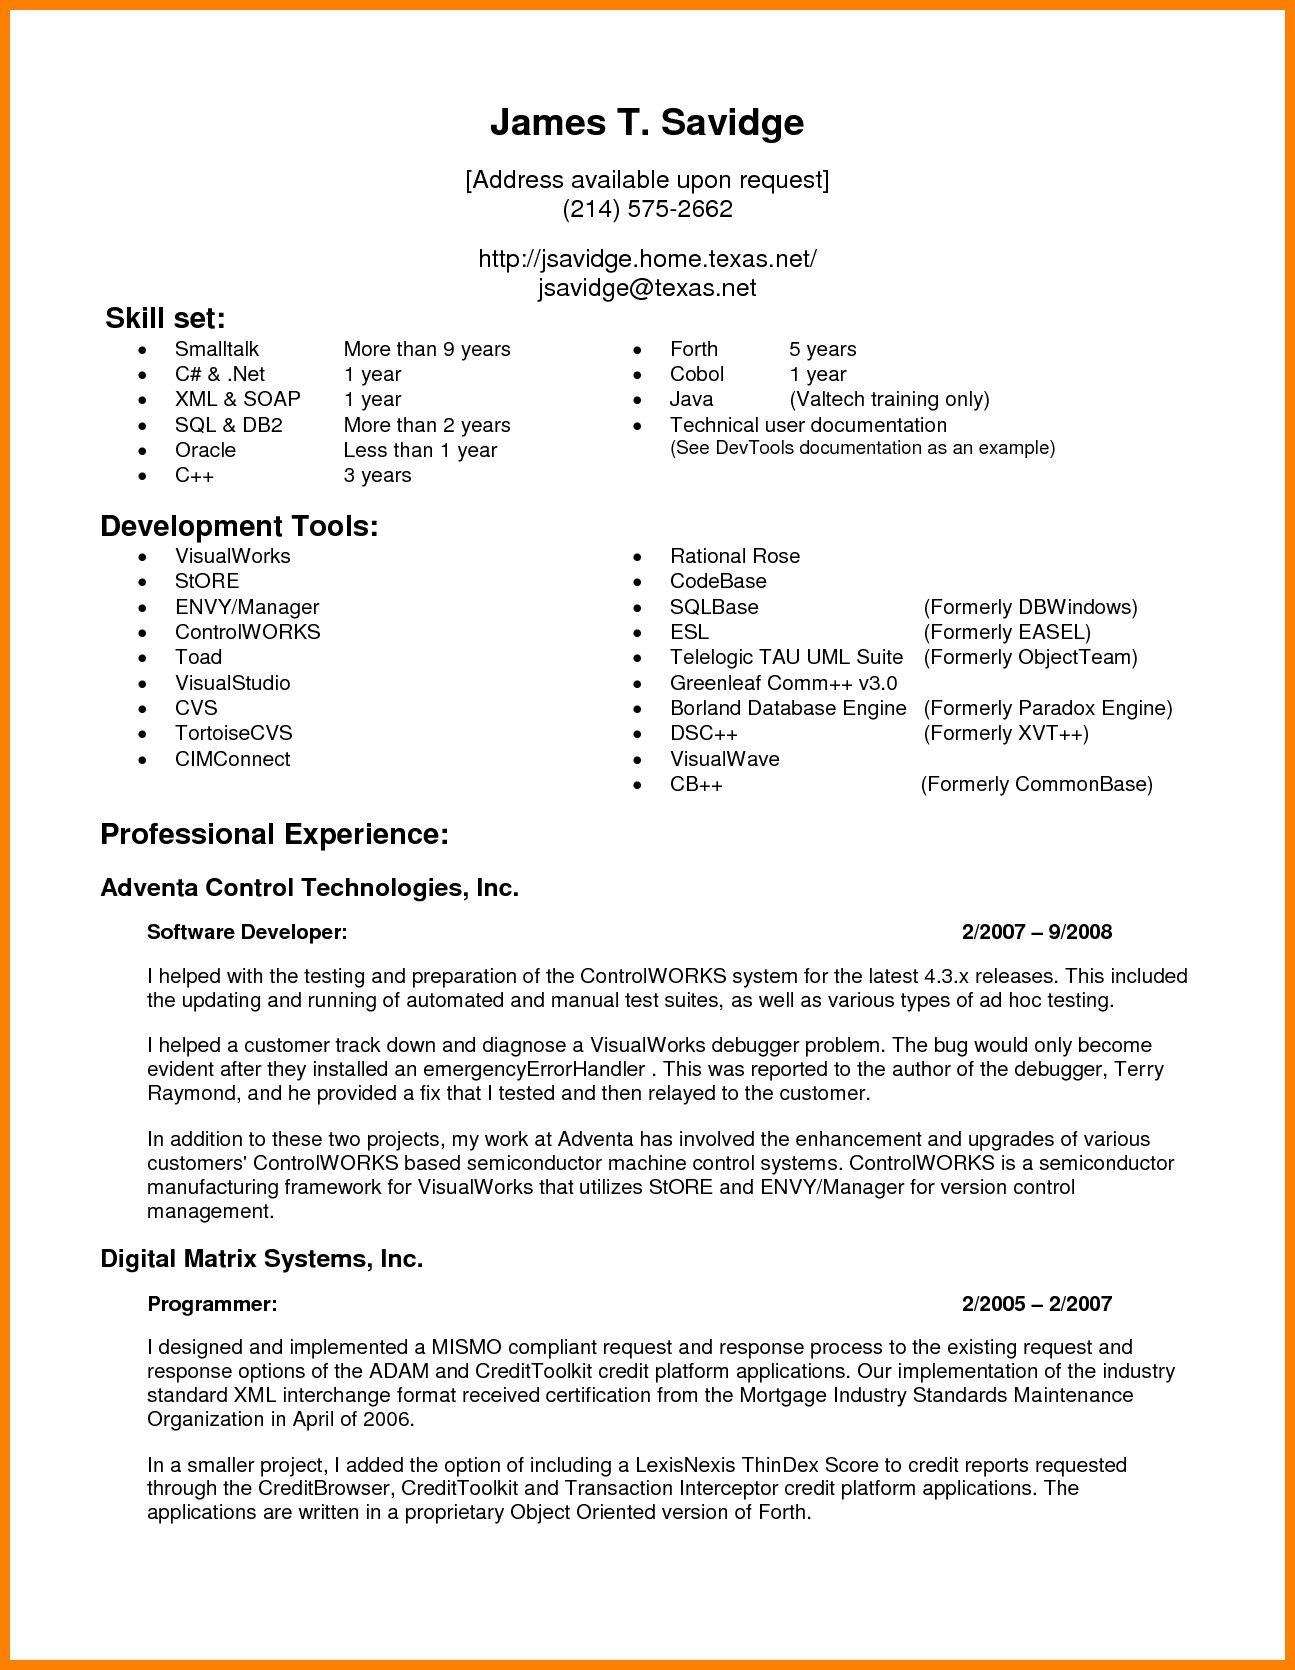 Resume Format Options Resume format, Resume format free